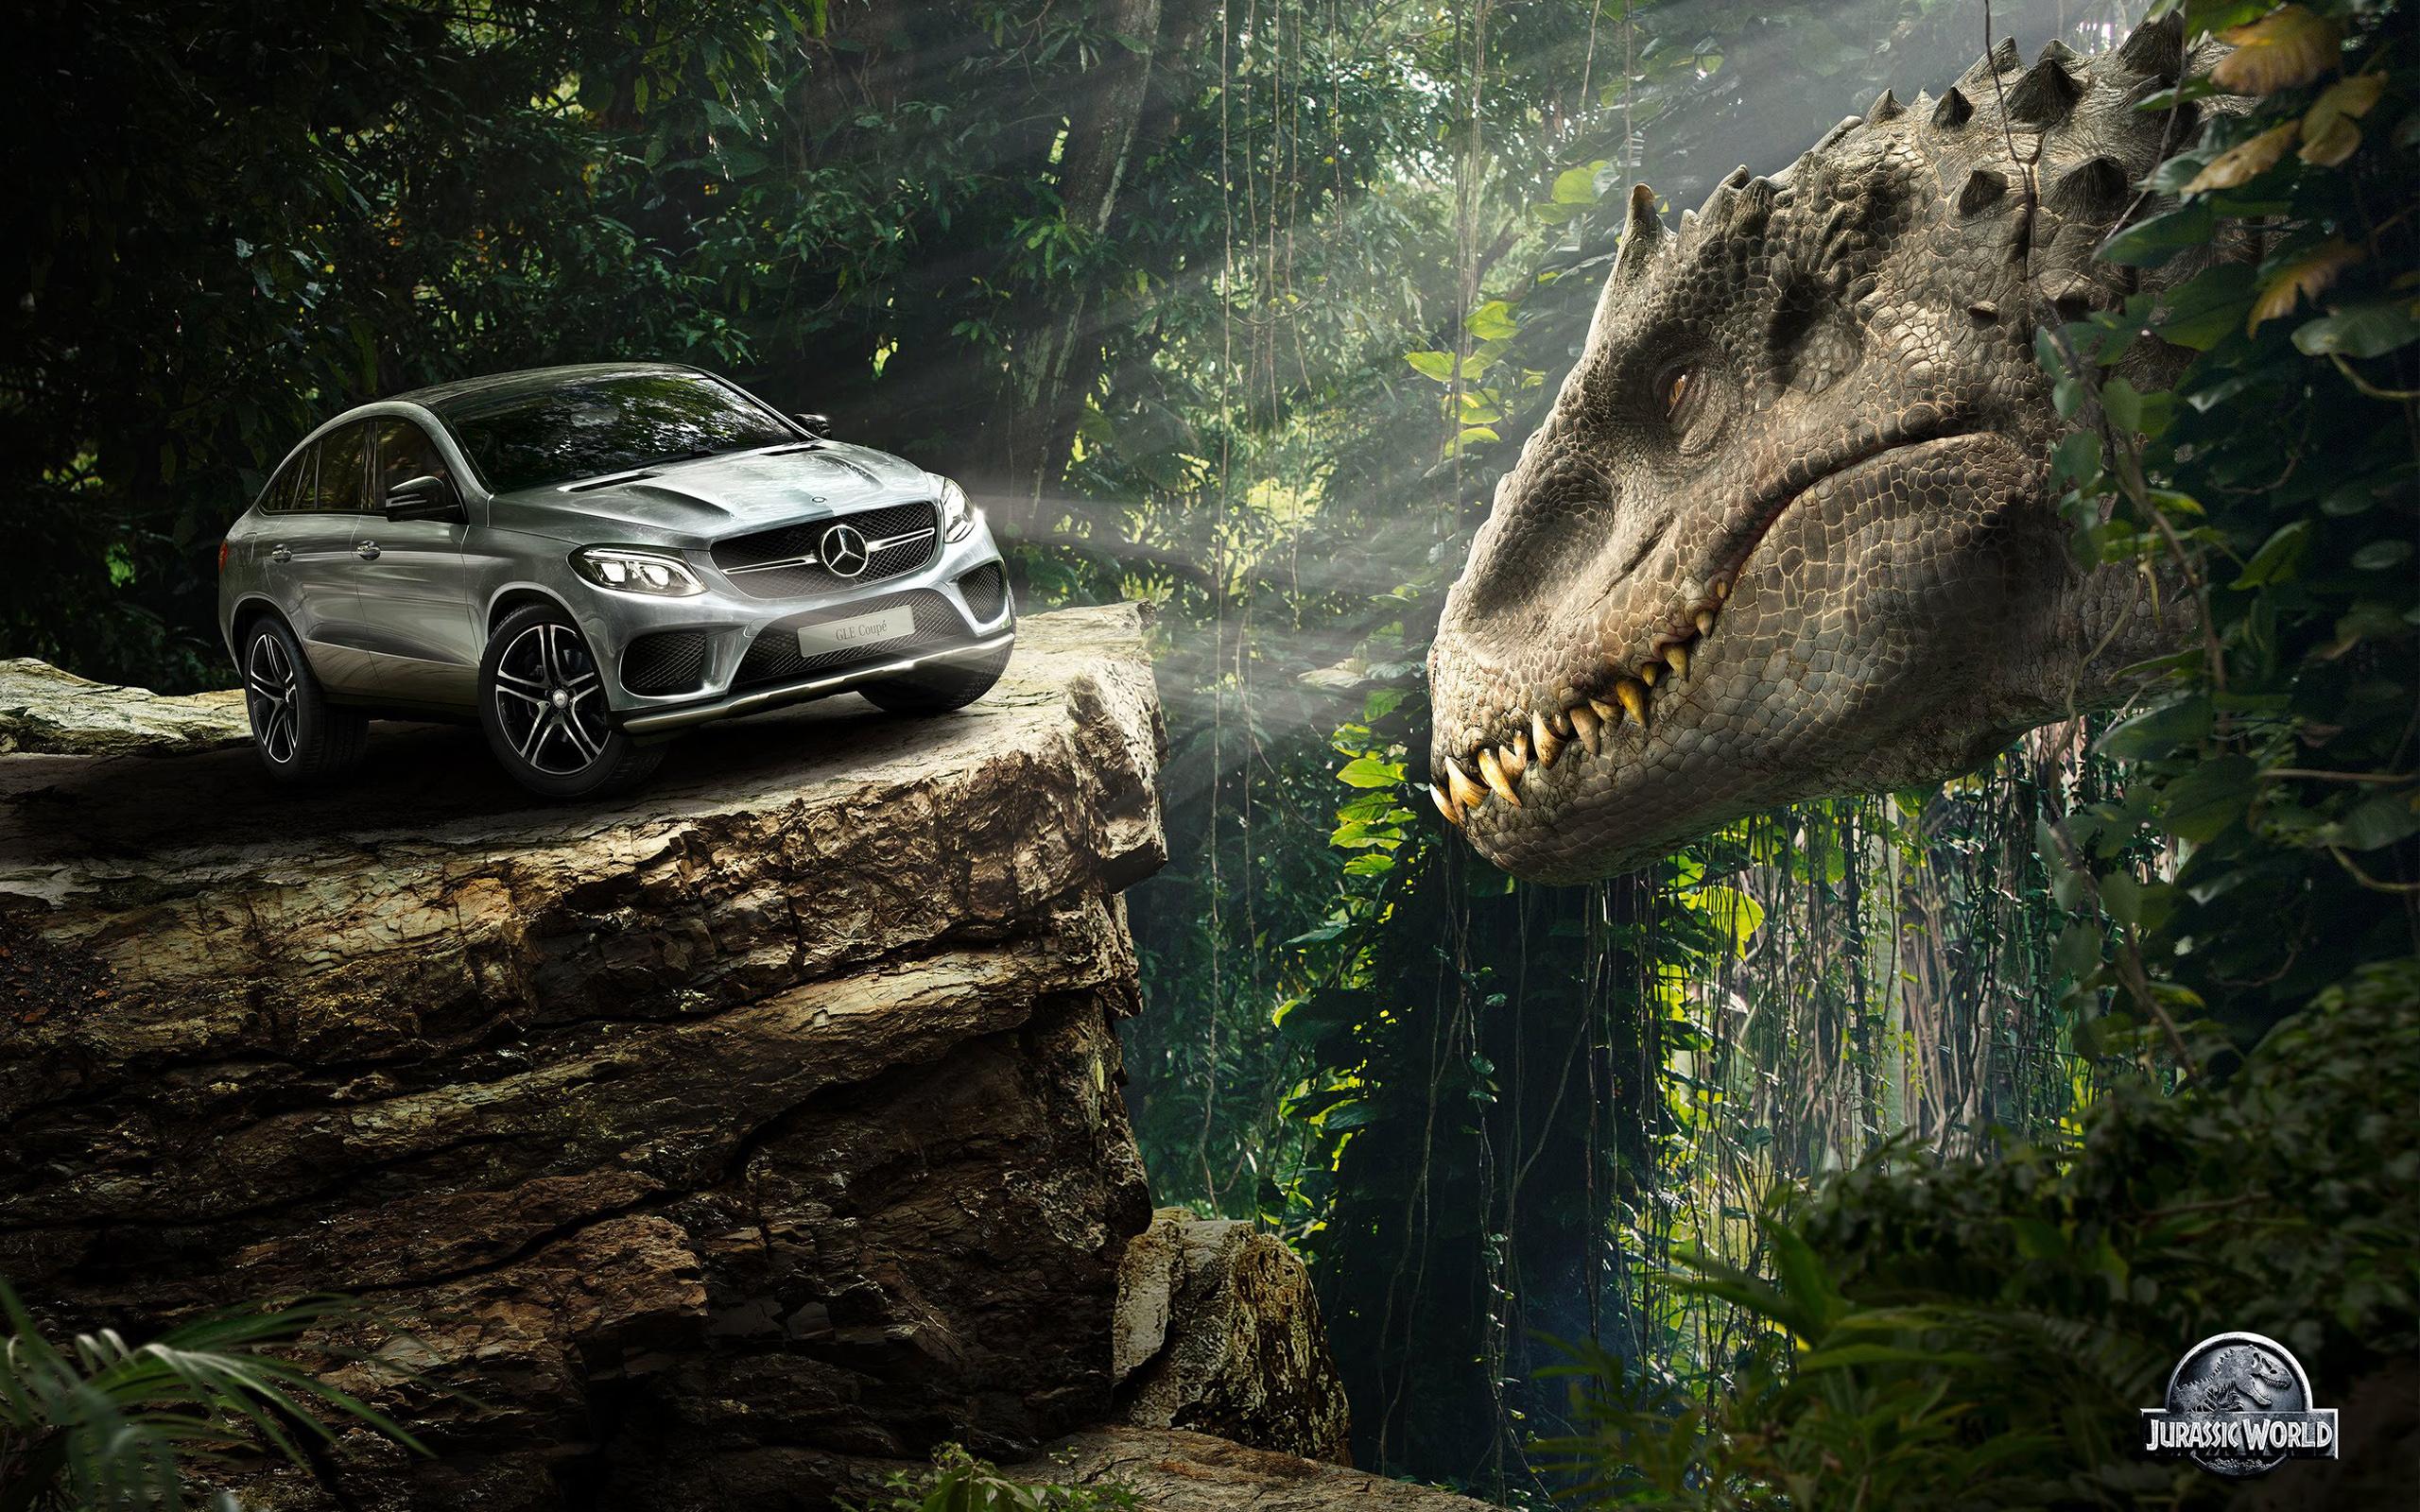 Jurassic World HD Wallpaper   Background Image   2560x1600 ...